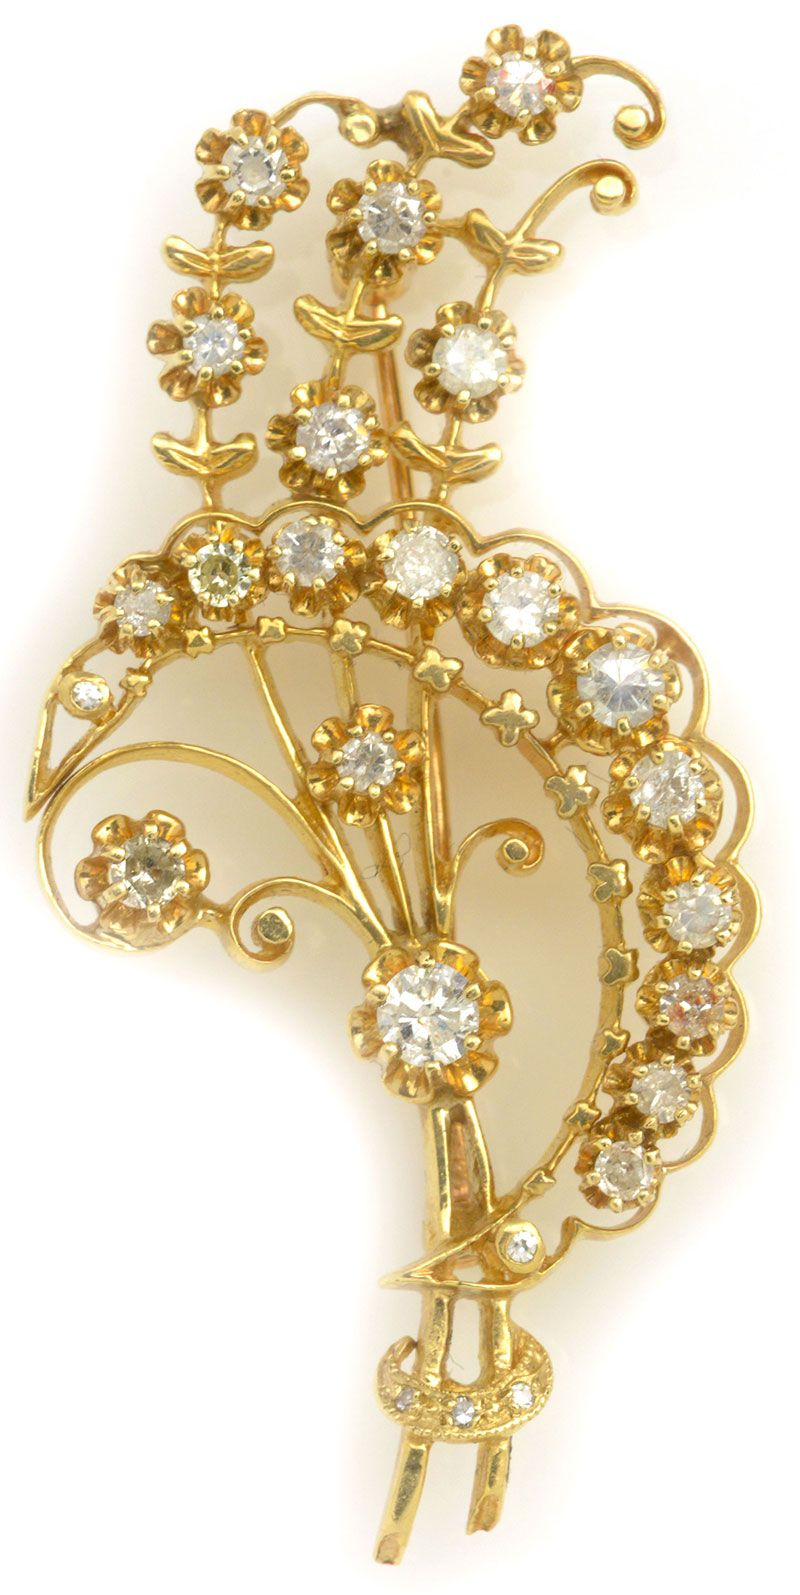 White Diamond Pin in Yellow Gold. Item #368-58216 Estate 1.35 ctw Diamond Round 14K Yellow Gold Pin Approx.Wt.